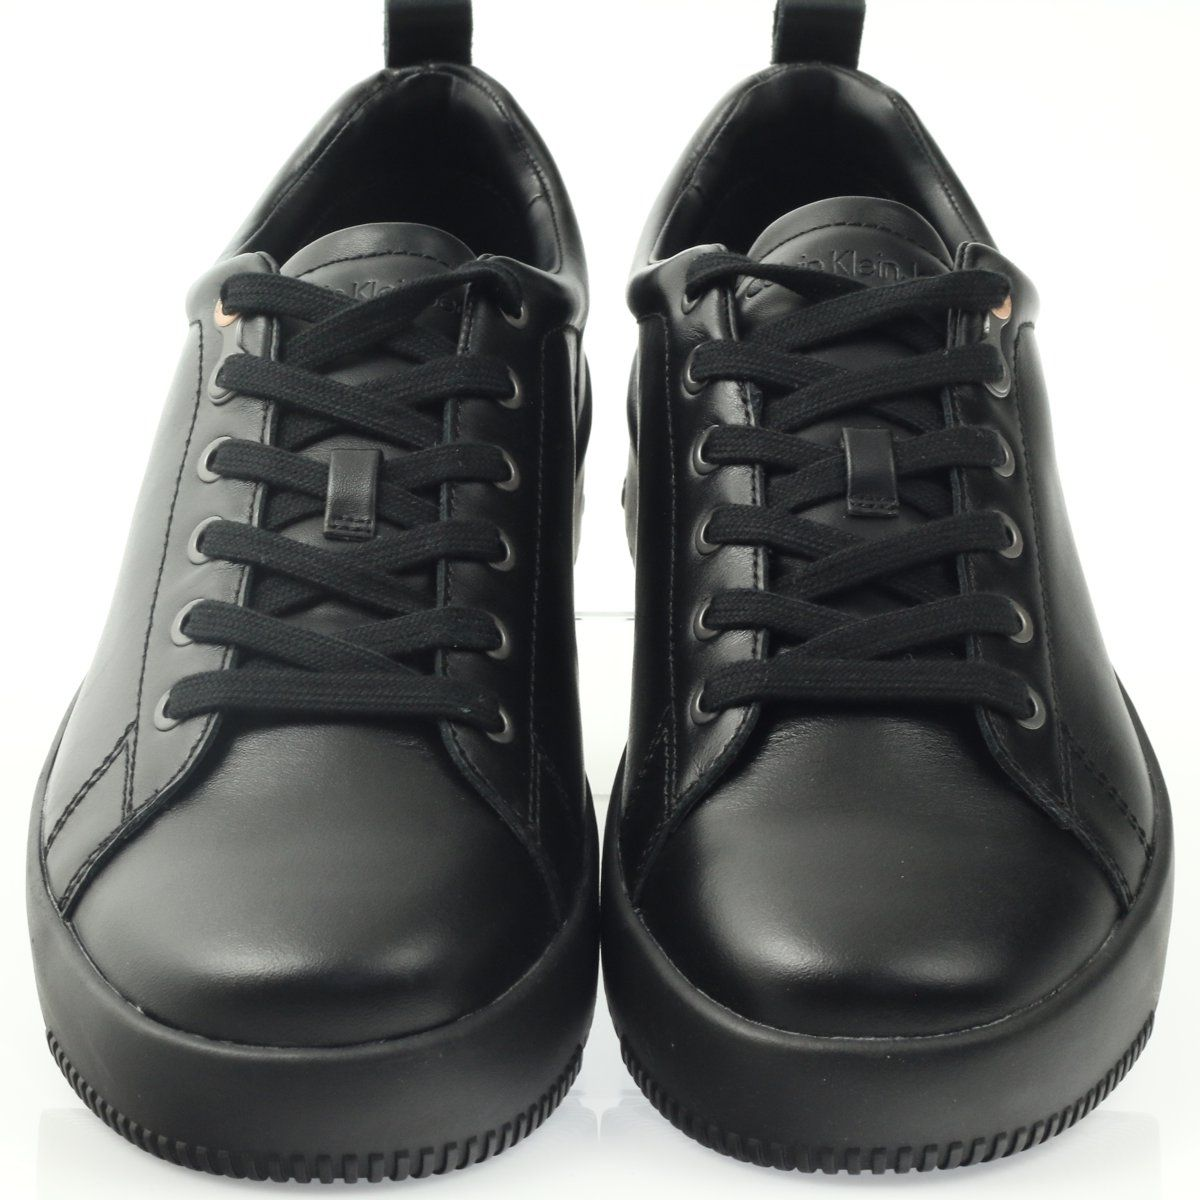 Sportowe Meskie Calvinkleinjeans Czarne Calvin Klein Jeans Gaetan Baby Calf Blk Calves Boots Calvin Klein Jeans